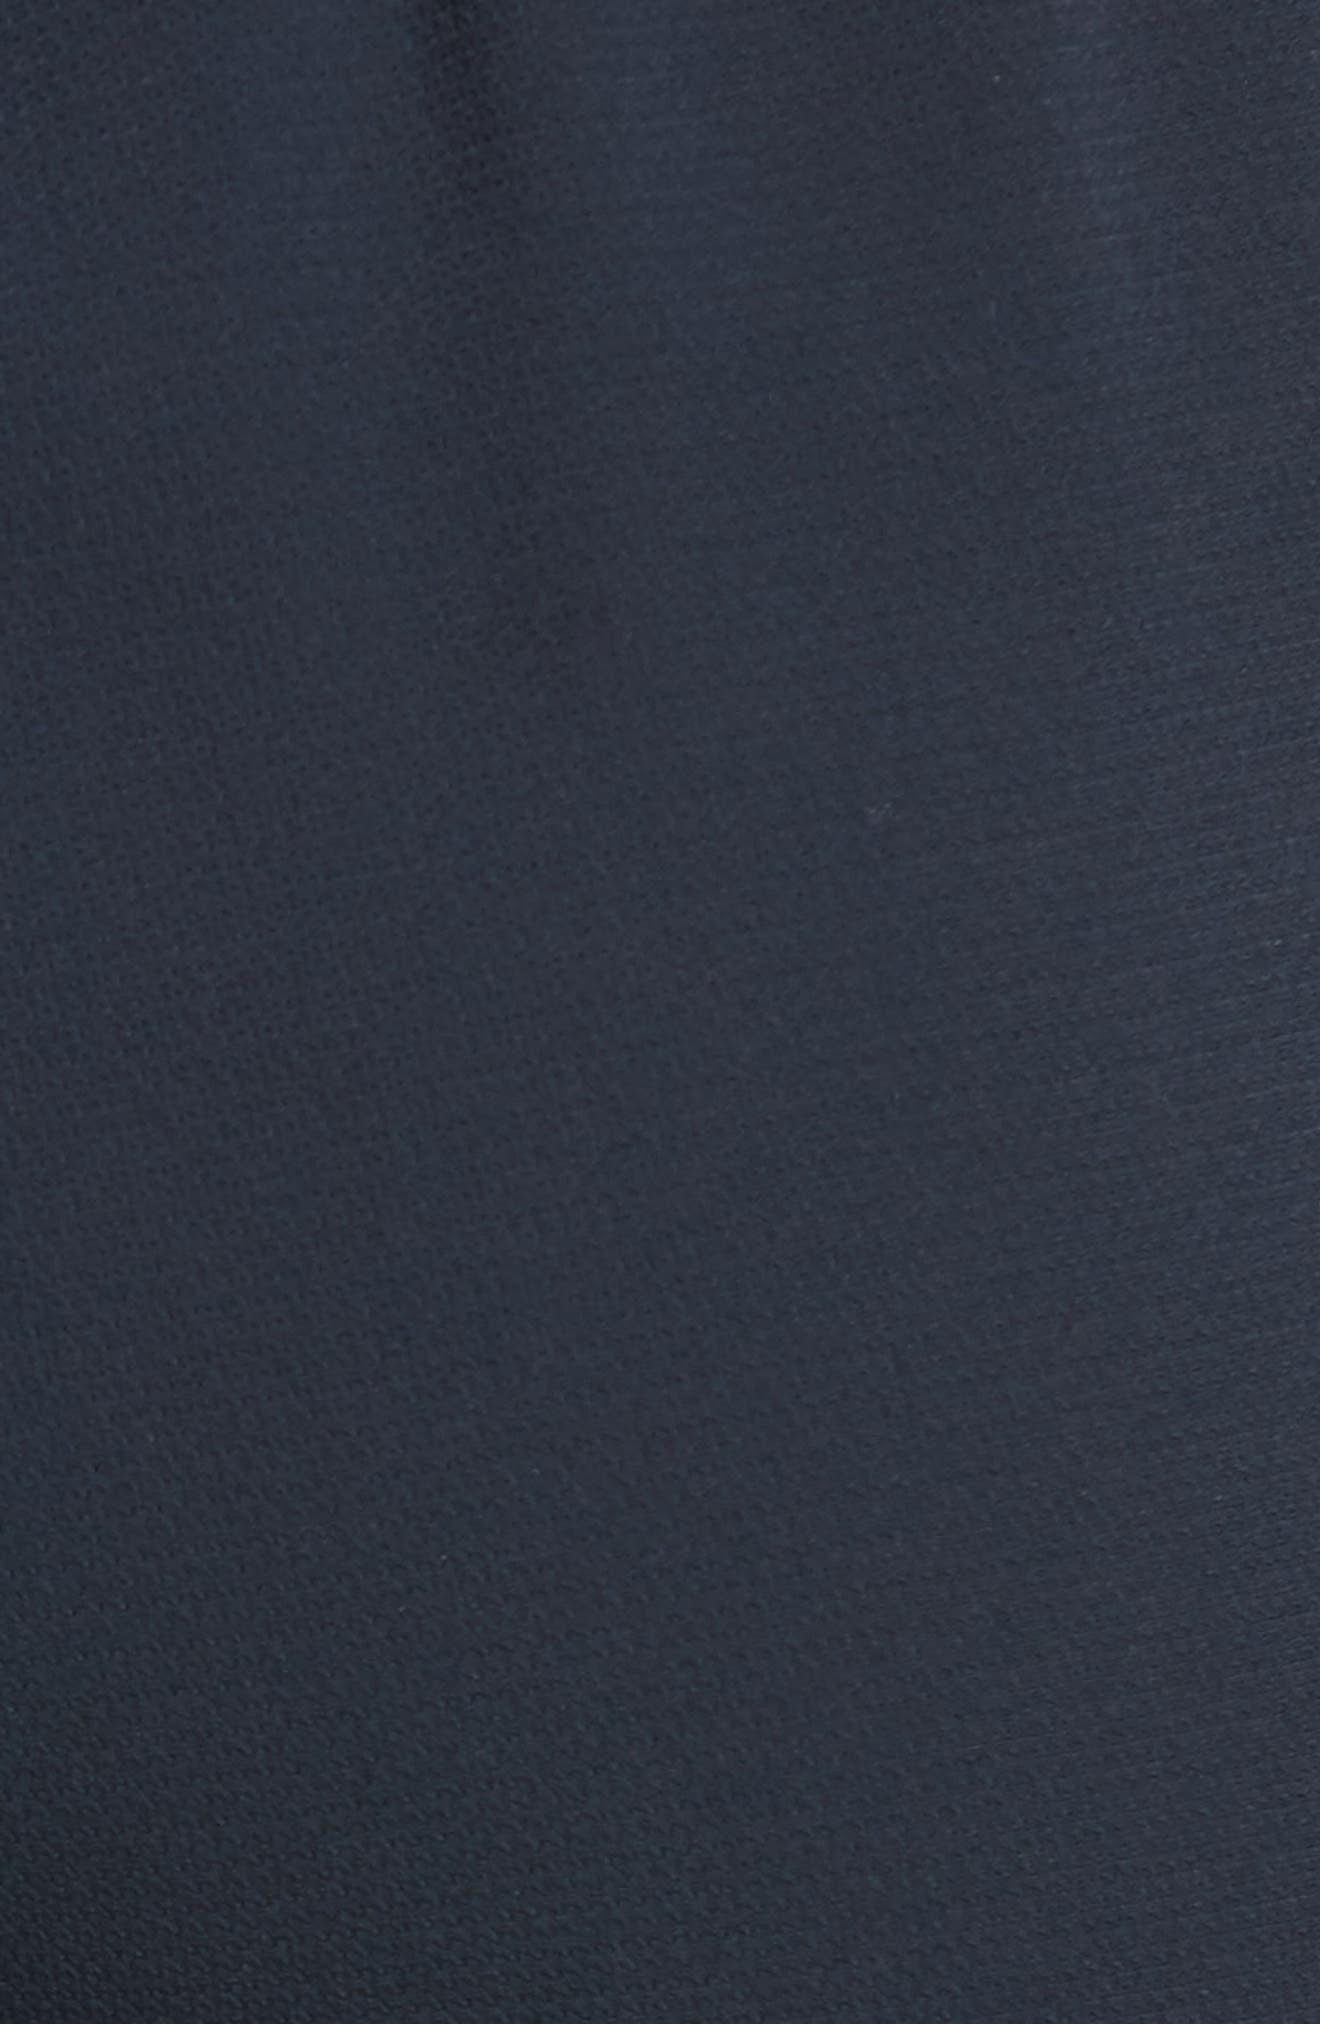 Armani Jeans Tech Jogger Pants,                             Alternate thumbnail 3, color,                             Navy